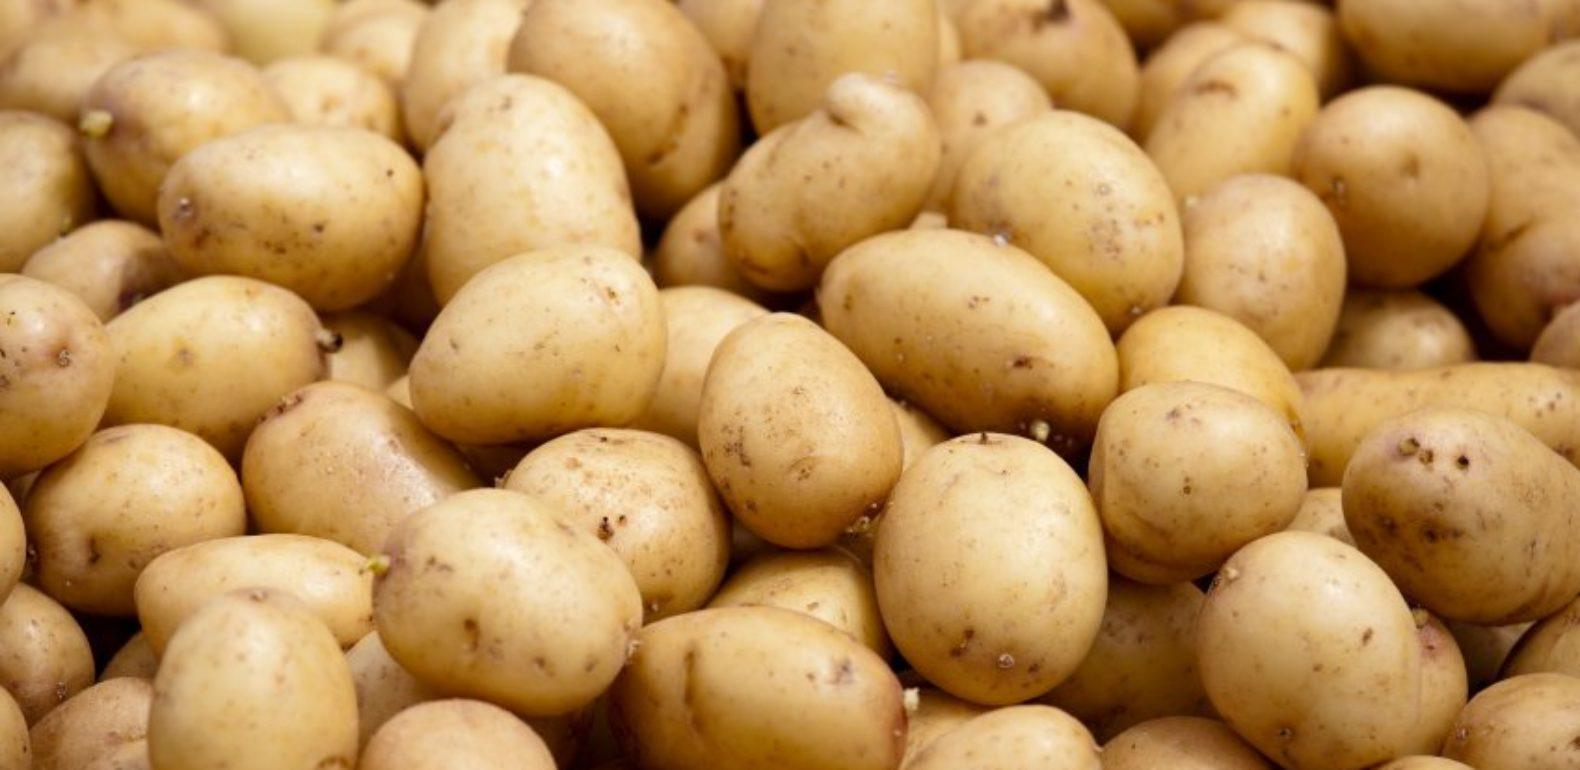 cee98ca1e8b Le jus de pomme de terre